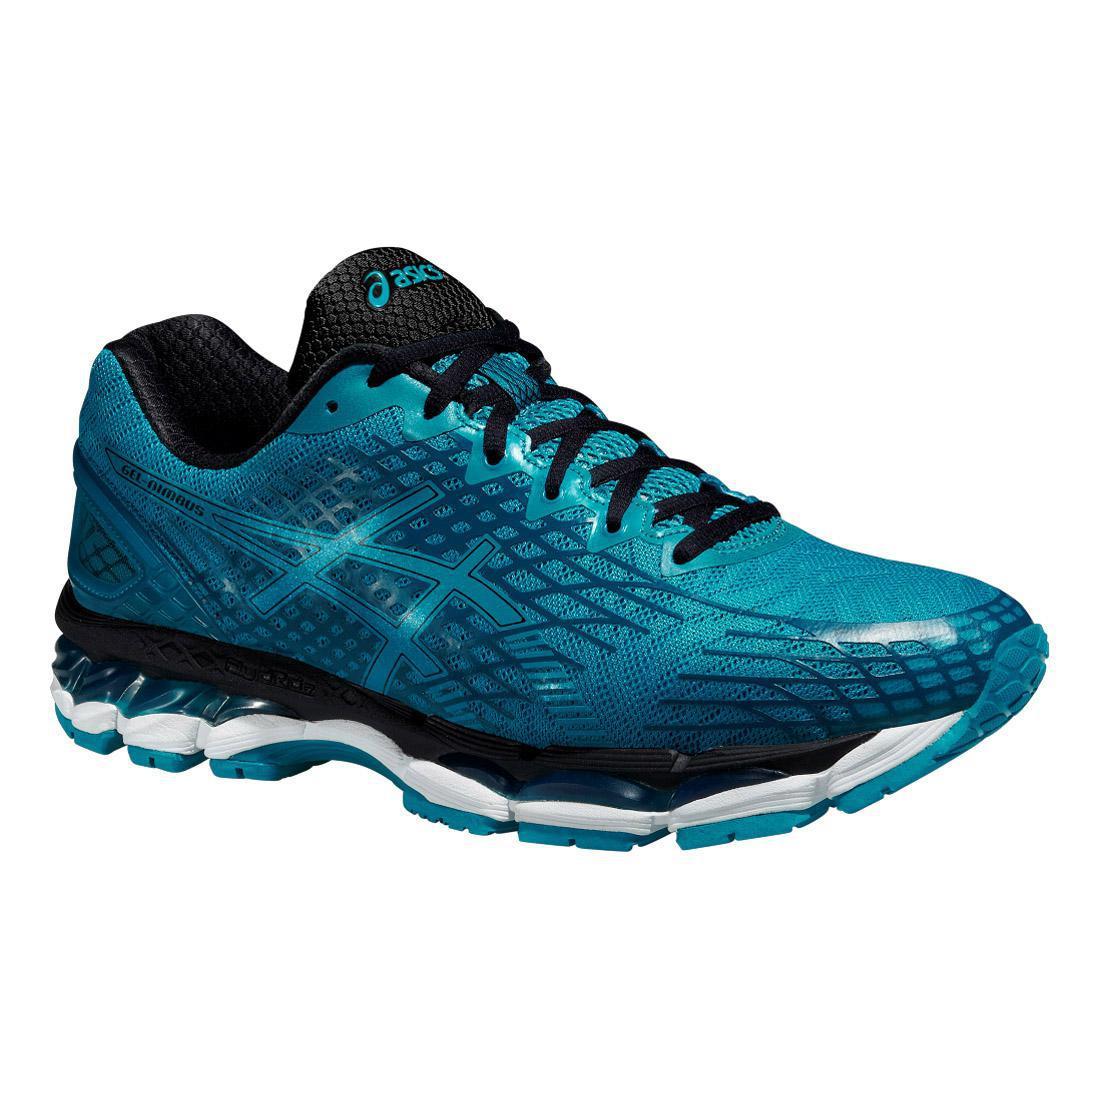 asics mens gel nimbus 17 lite show running shoes blue. Black Bedroom Furniture Sets. Home Design Ideas